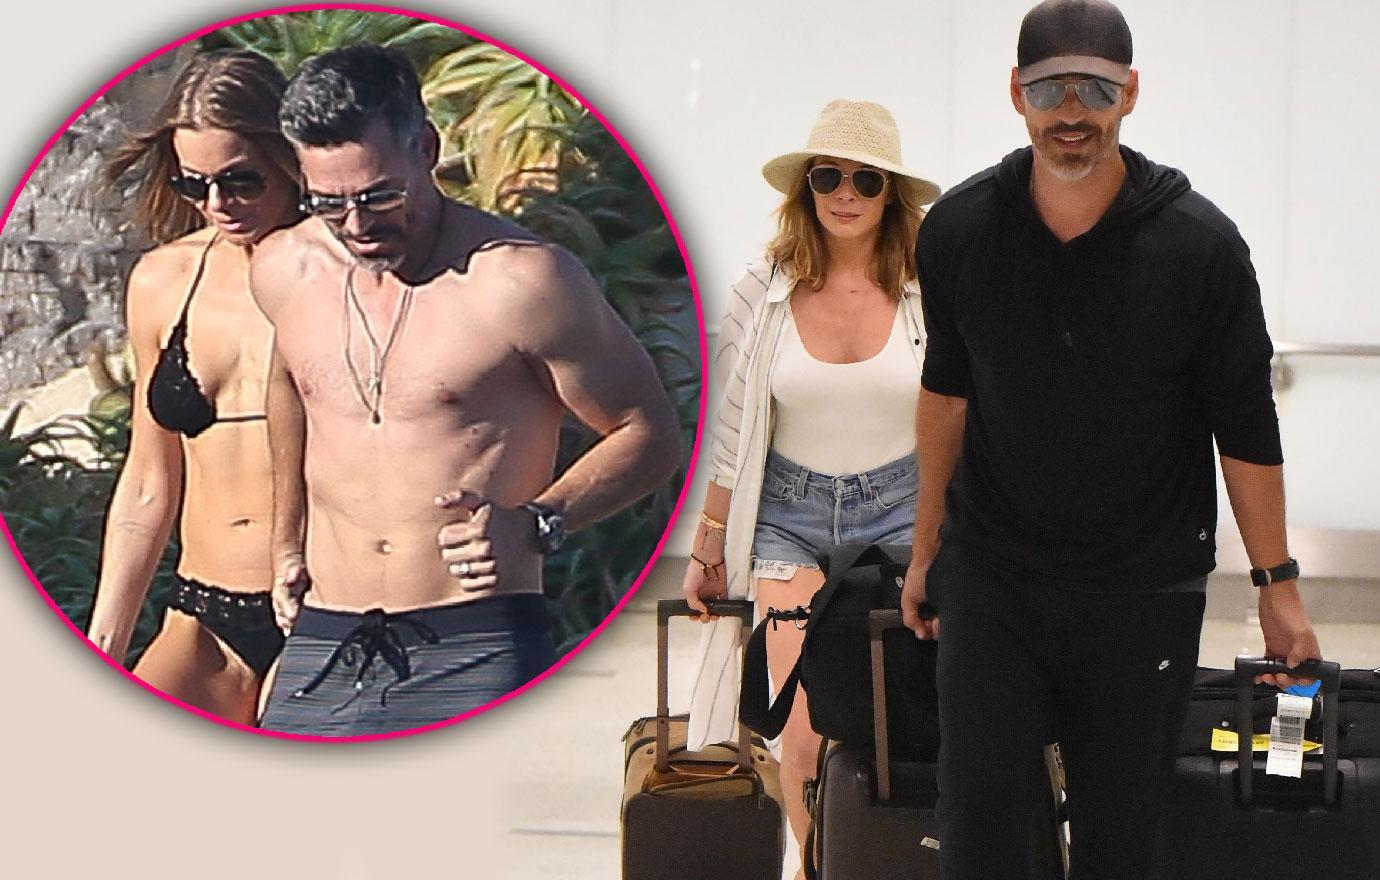 LeAnn Rimes Eddie Cibrian Return From Romantic Vacation